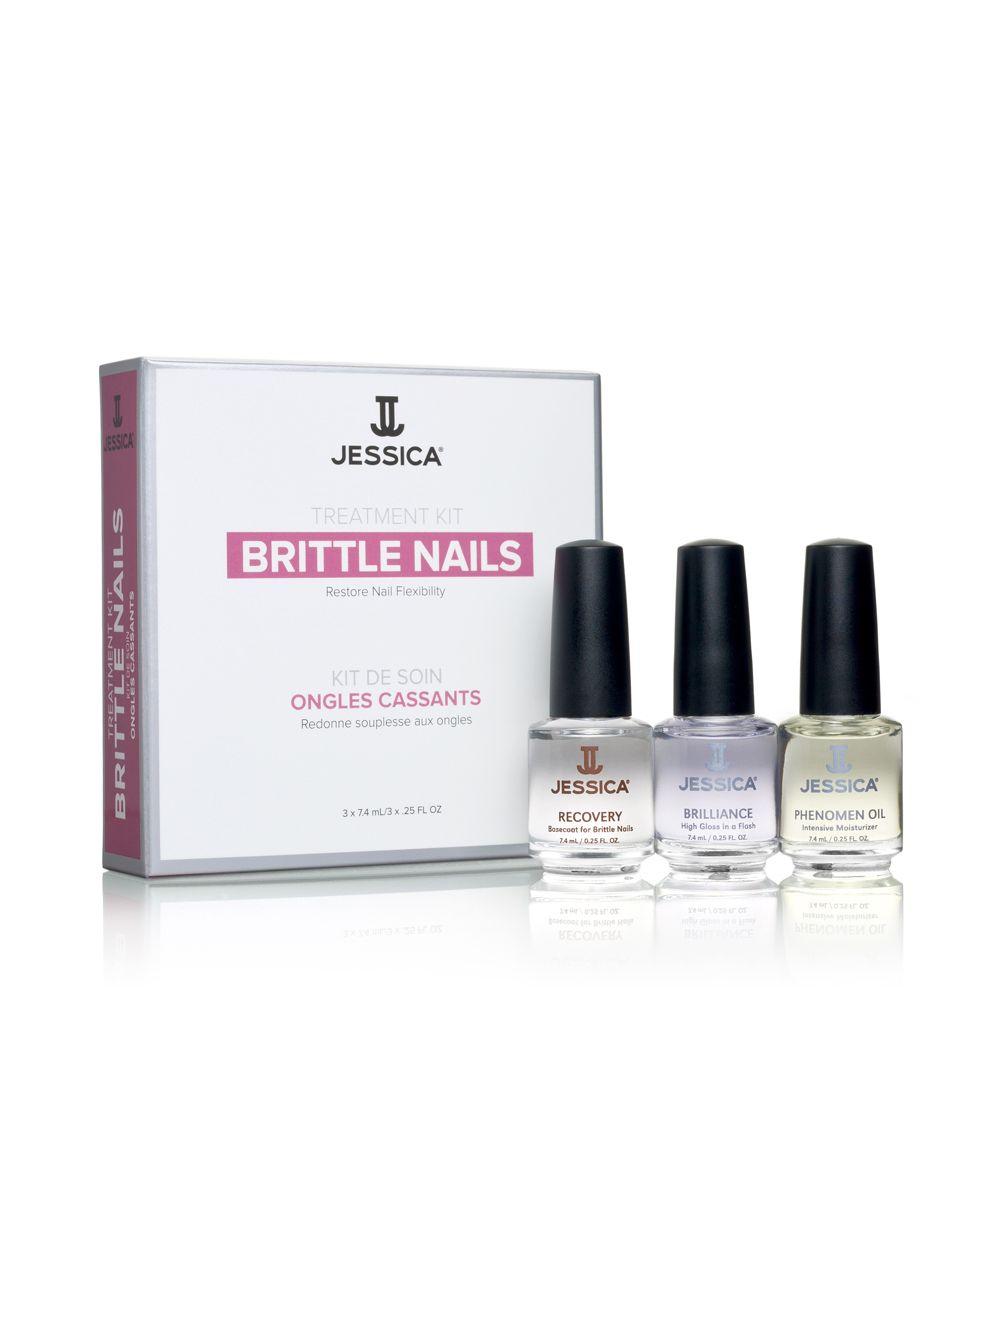 Jessica Cosmetics Treatment Kit Brittle Nails 1